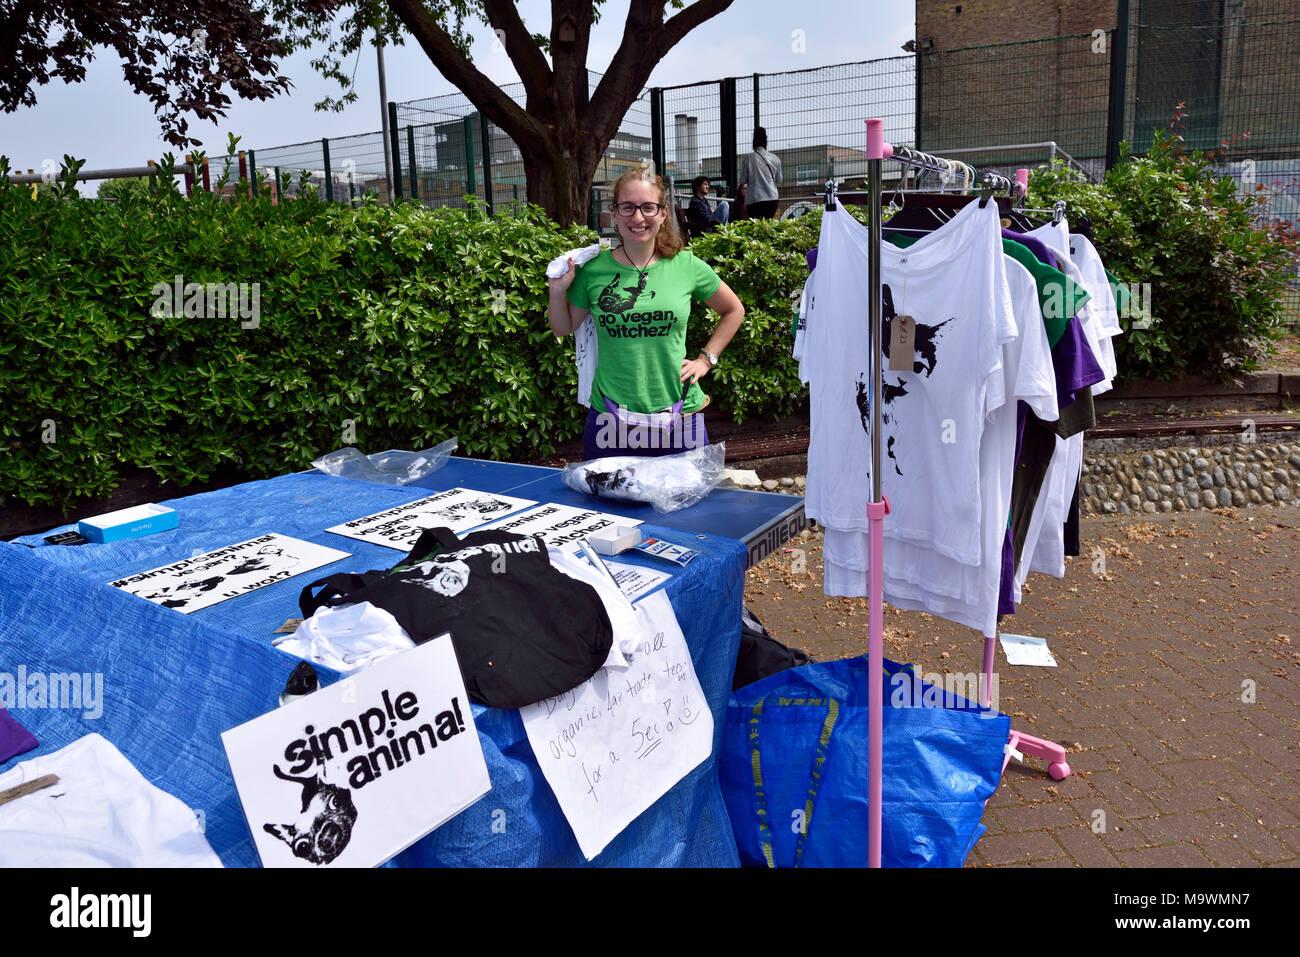 Woman selling Go Vegan tee shirts from stall at vegan festival Calthorpe Project, Greys Inn Road, London Borough of Camden, England Britain Uk - Stock Image